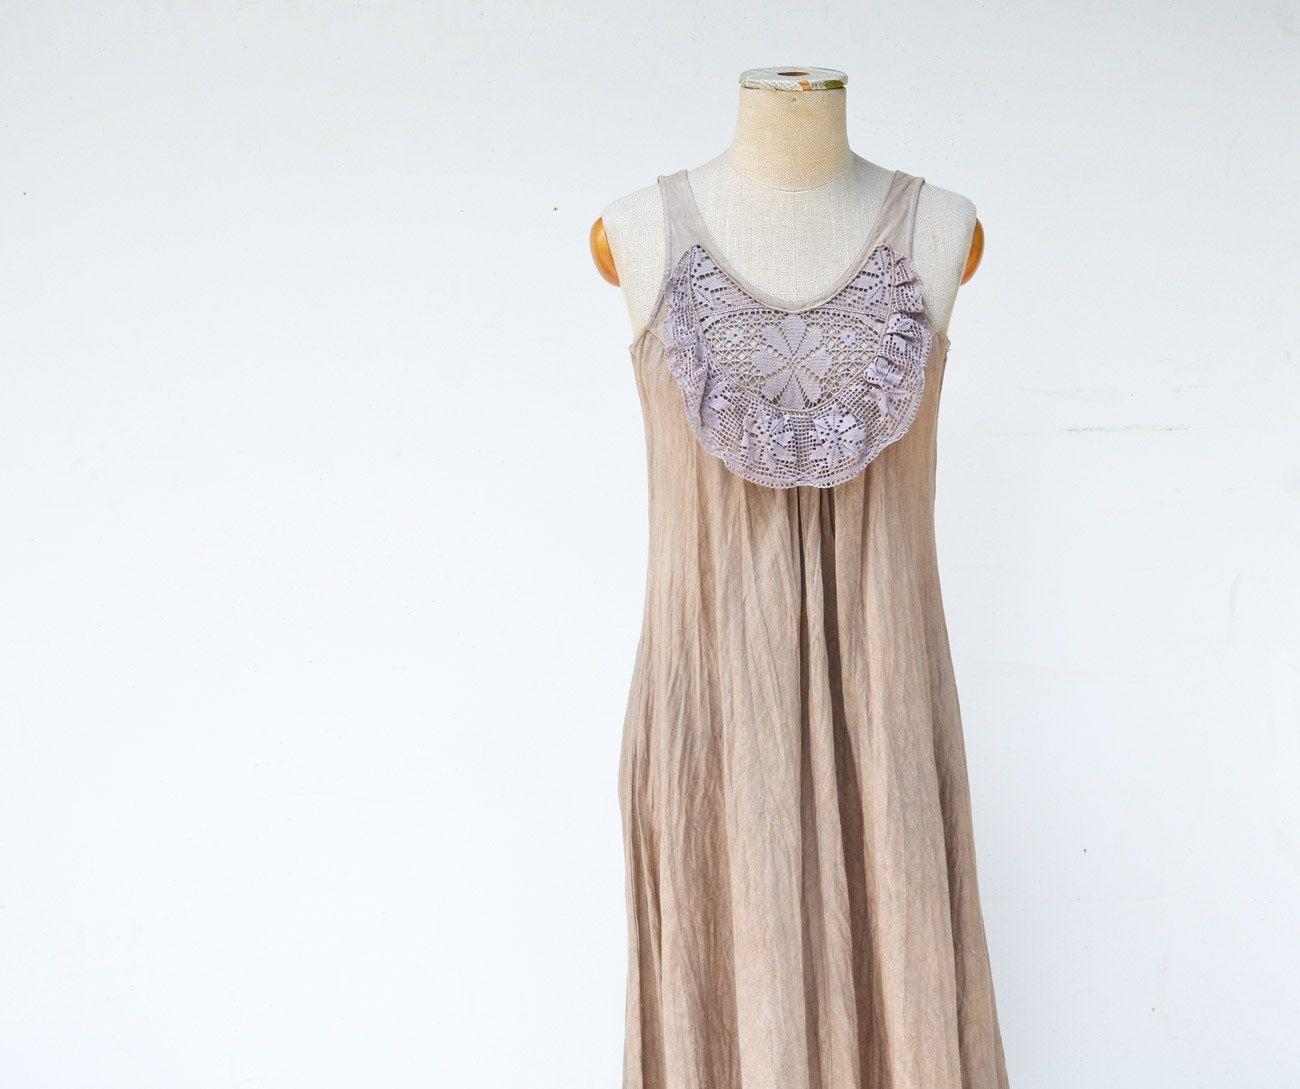 Long linen dress by zojka s sizeooak woman unique fashion